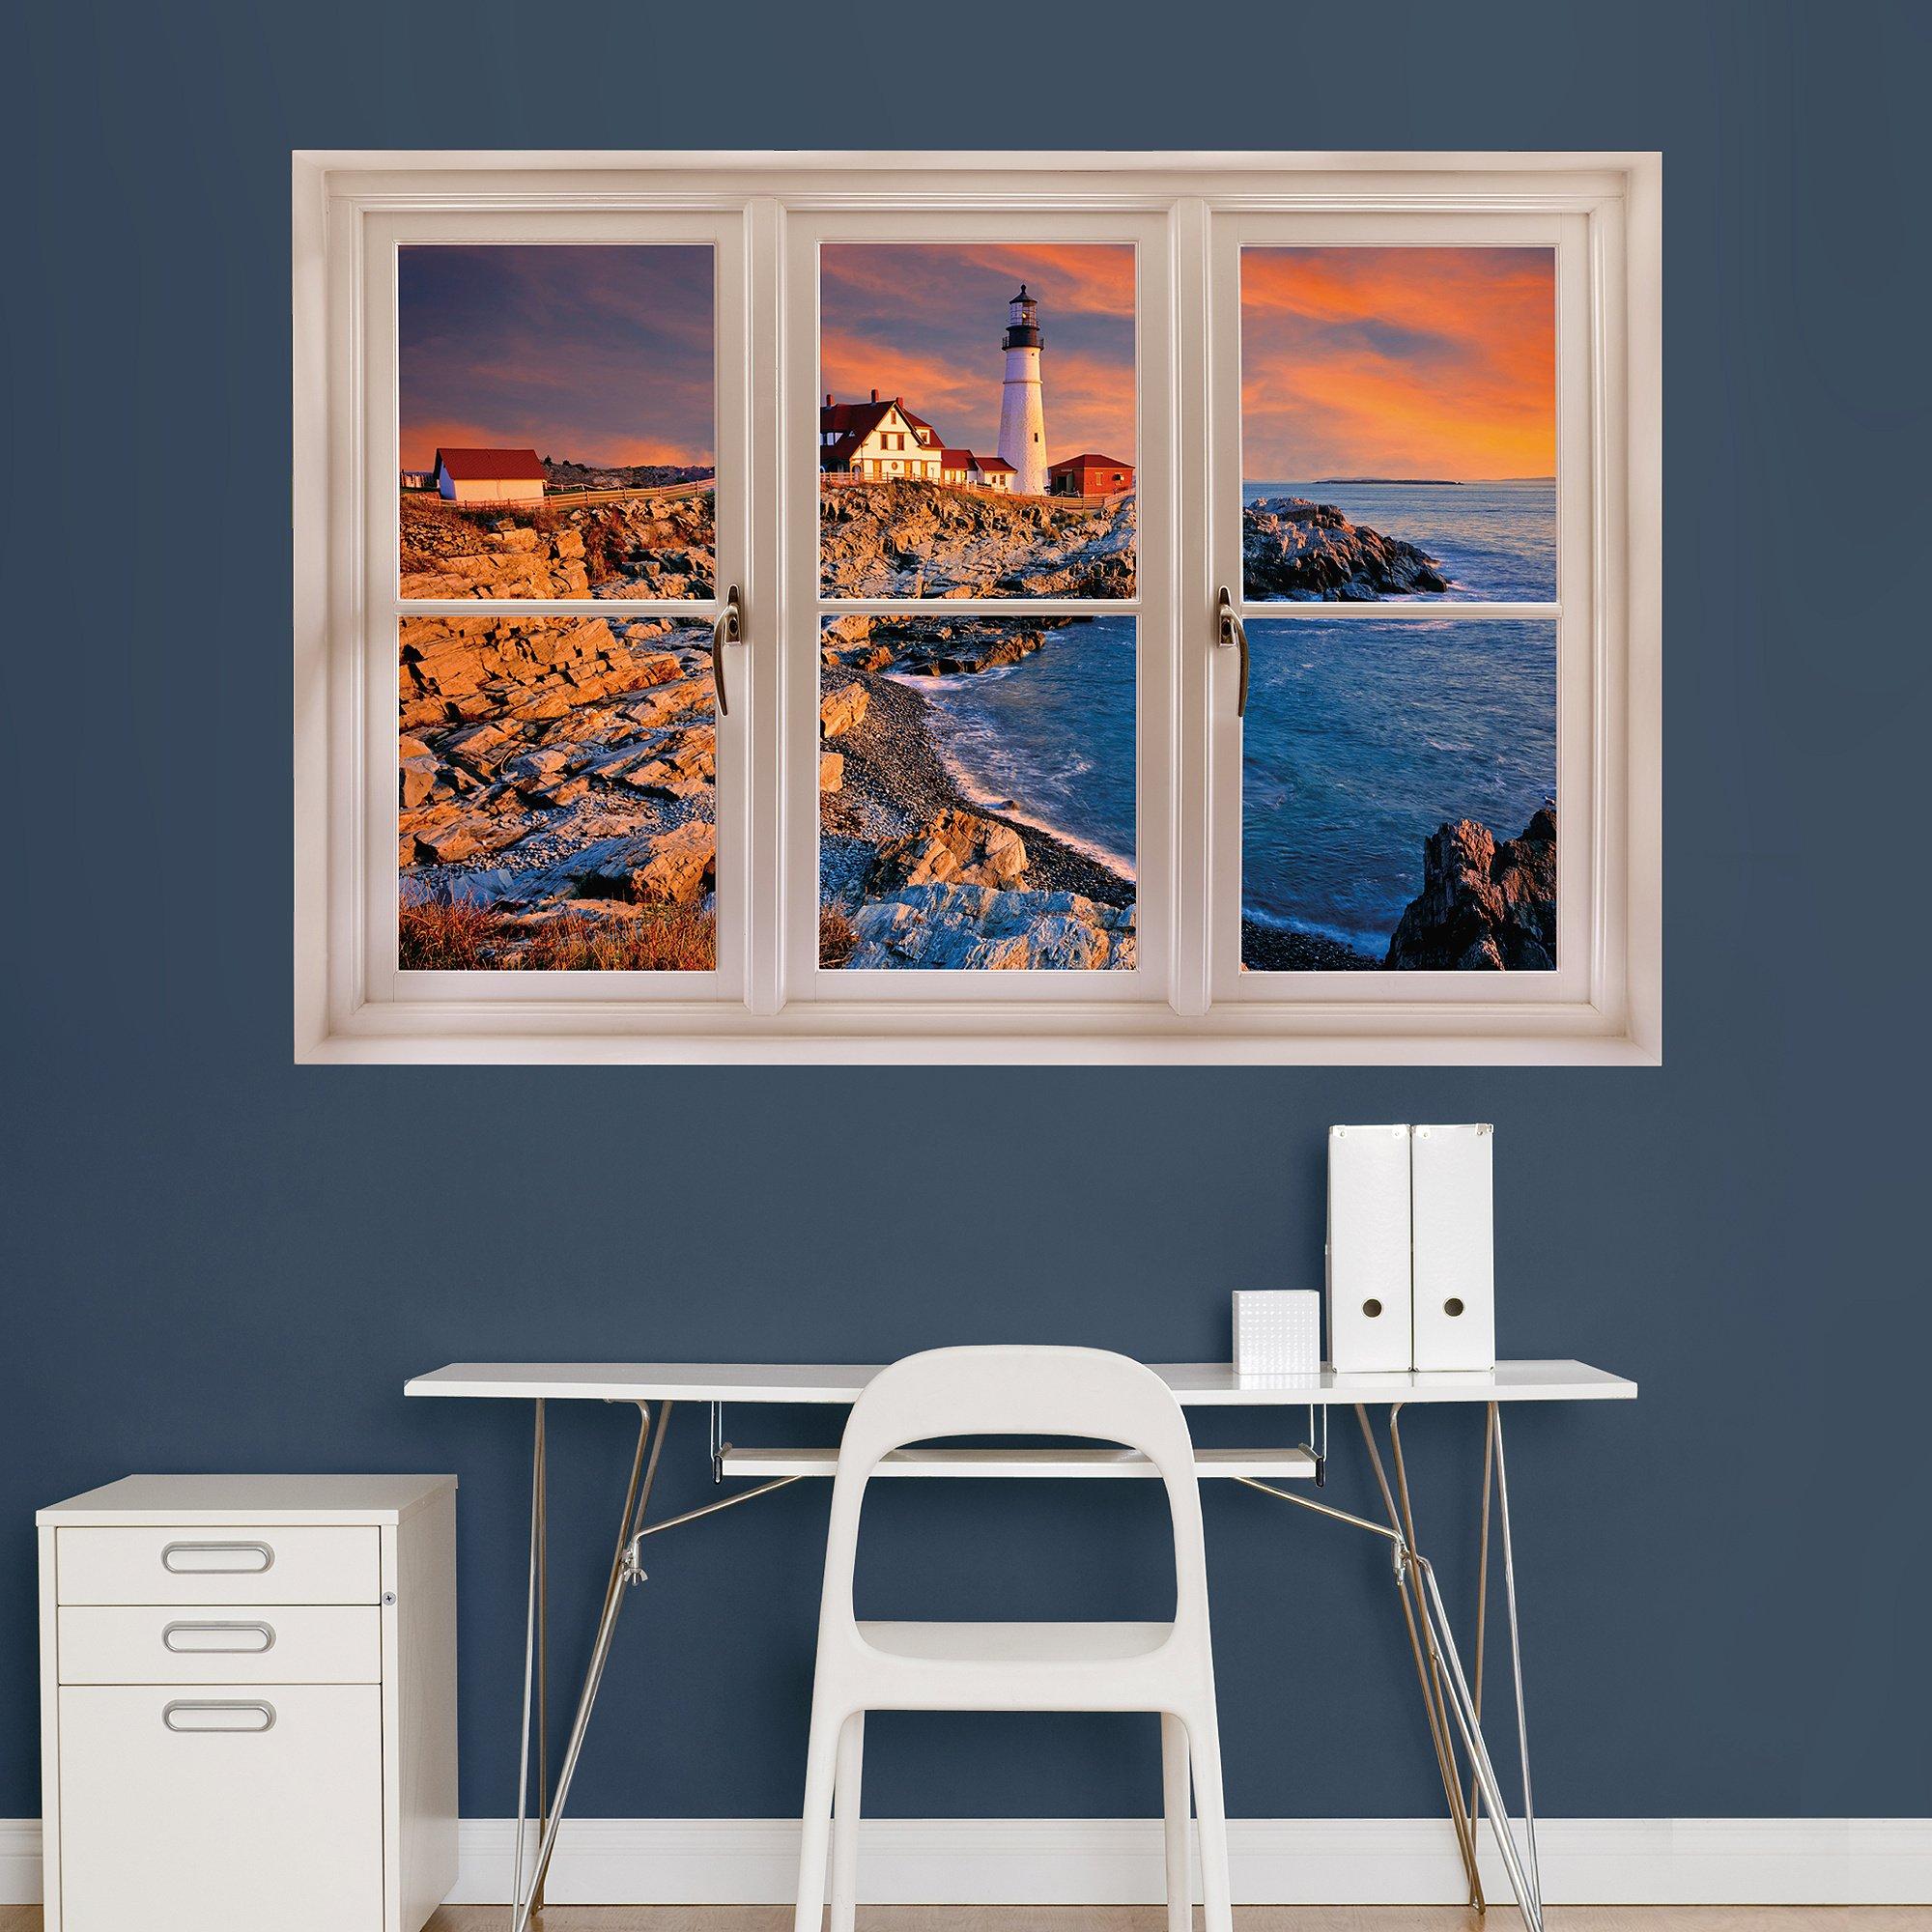 Fathead Wall Decal, ''Portland, Maine Lighthouse Instant Window''